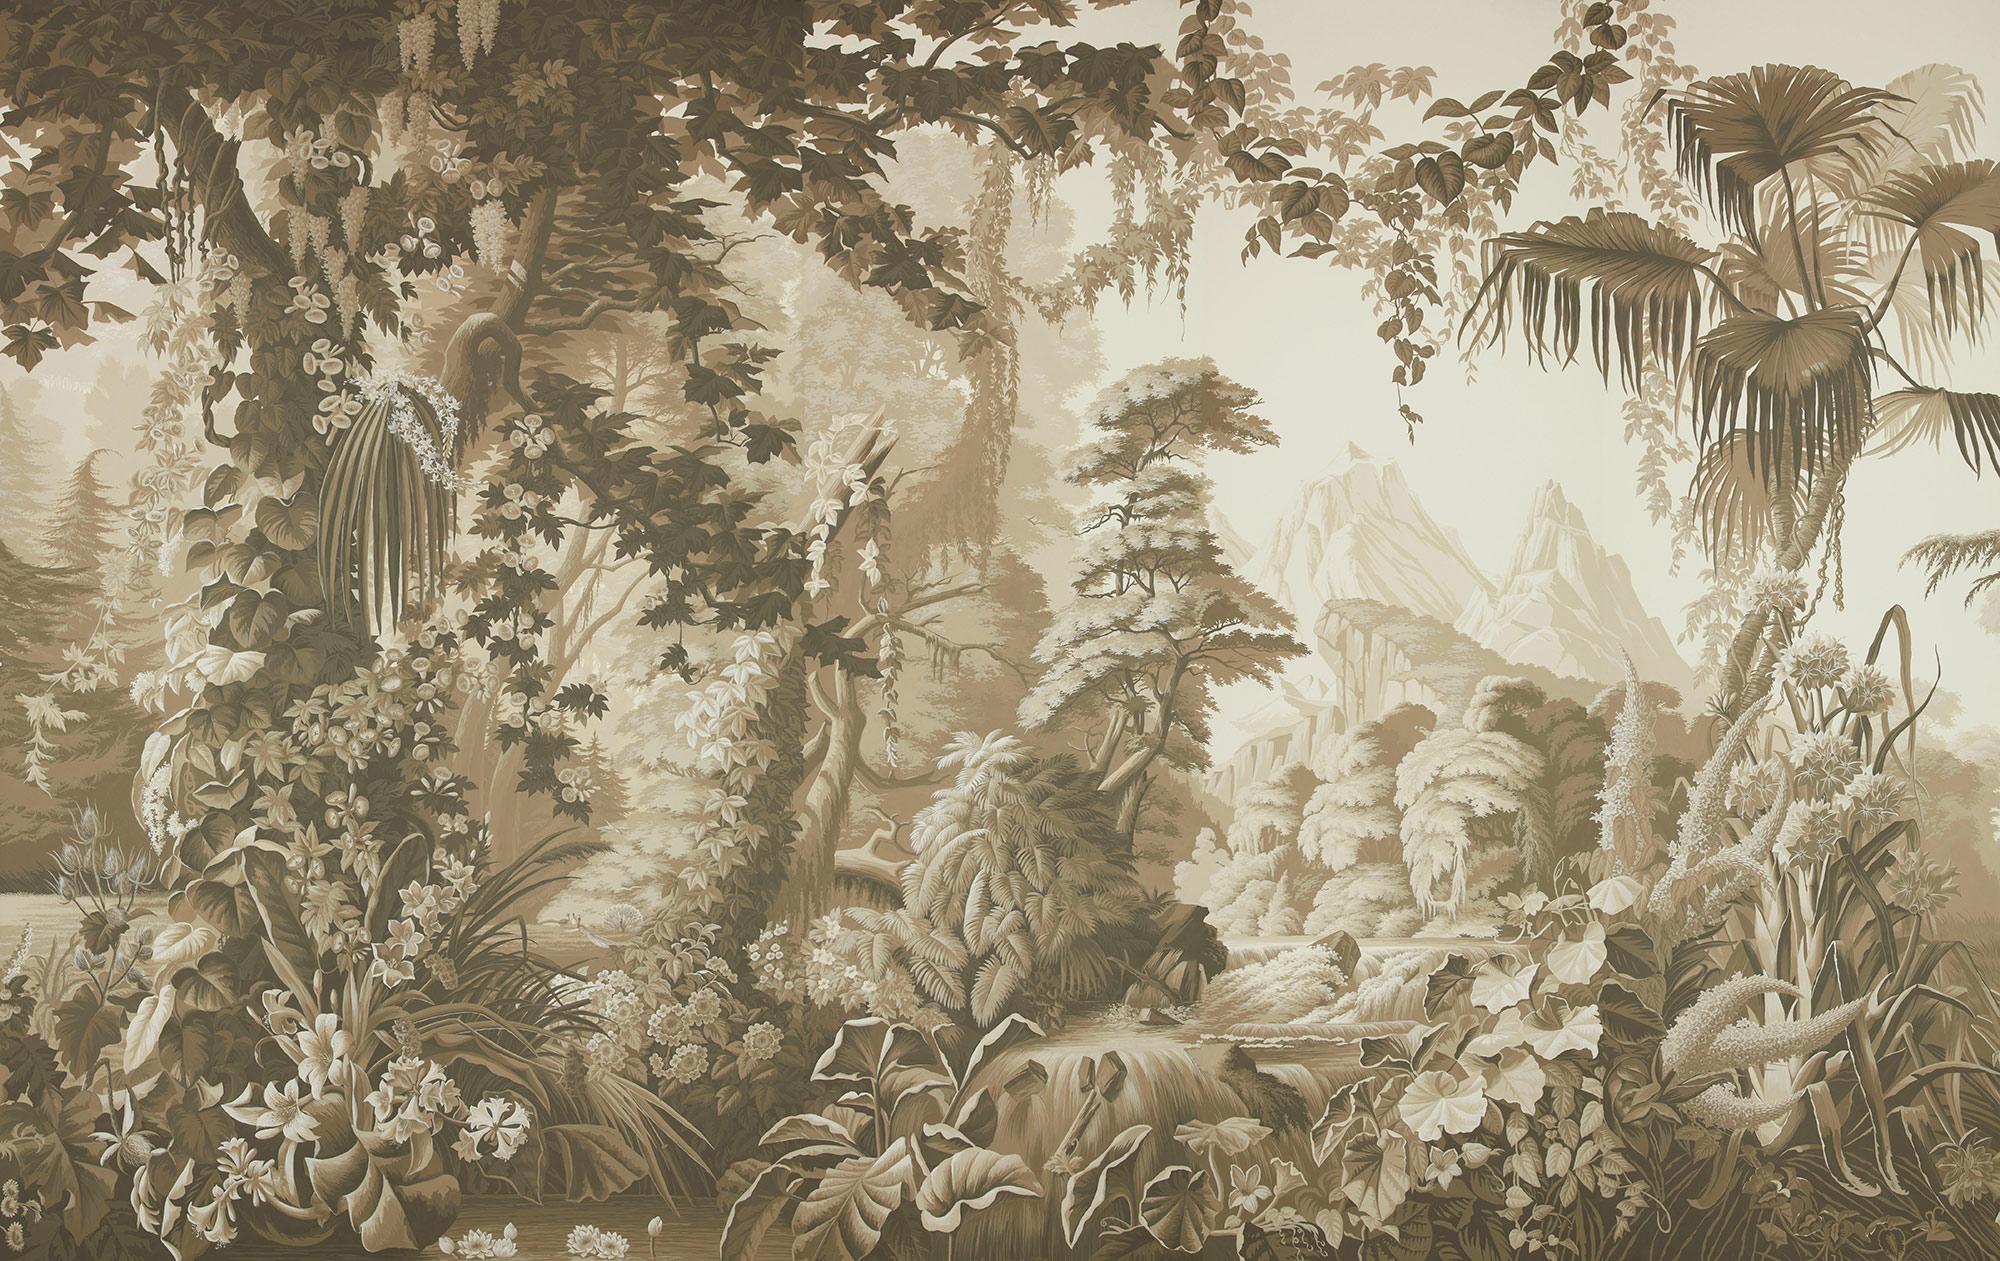 Sepia on scenic paper